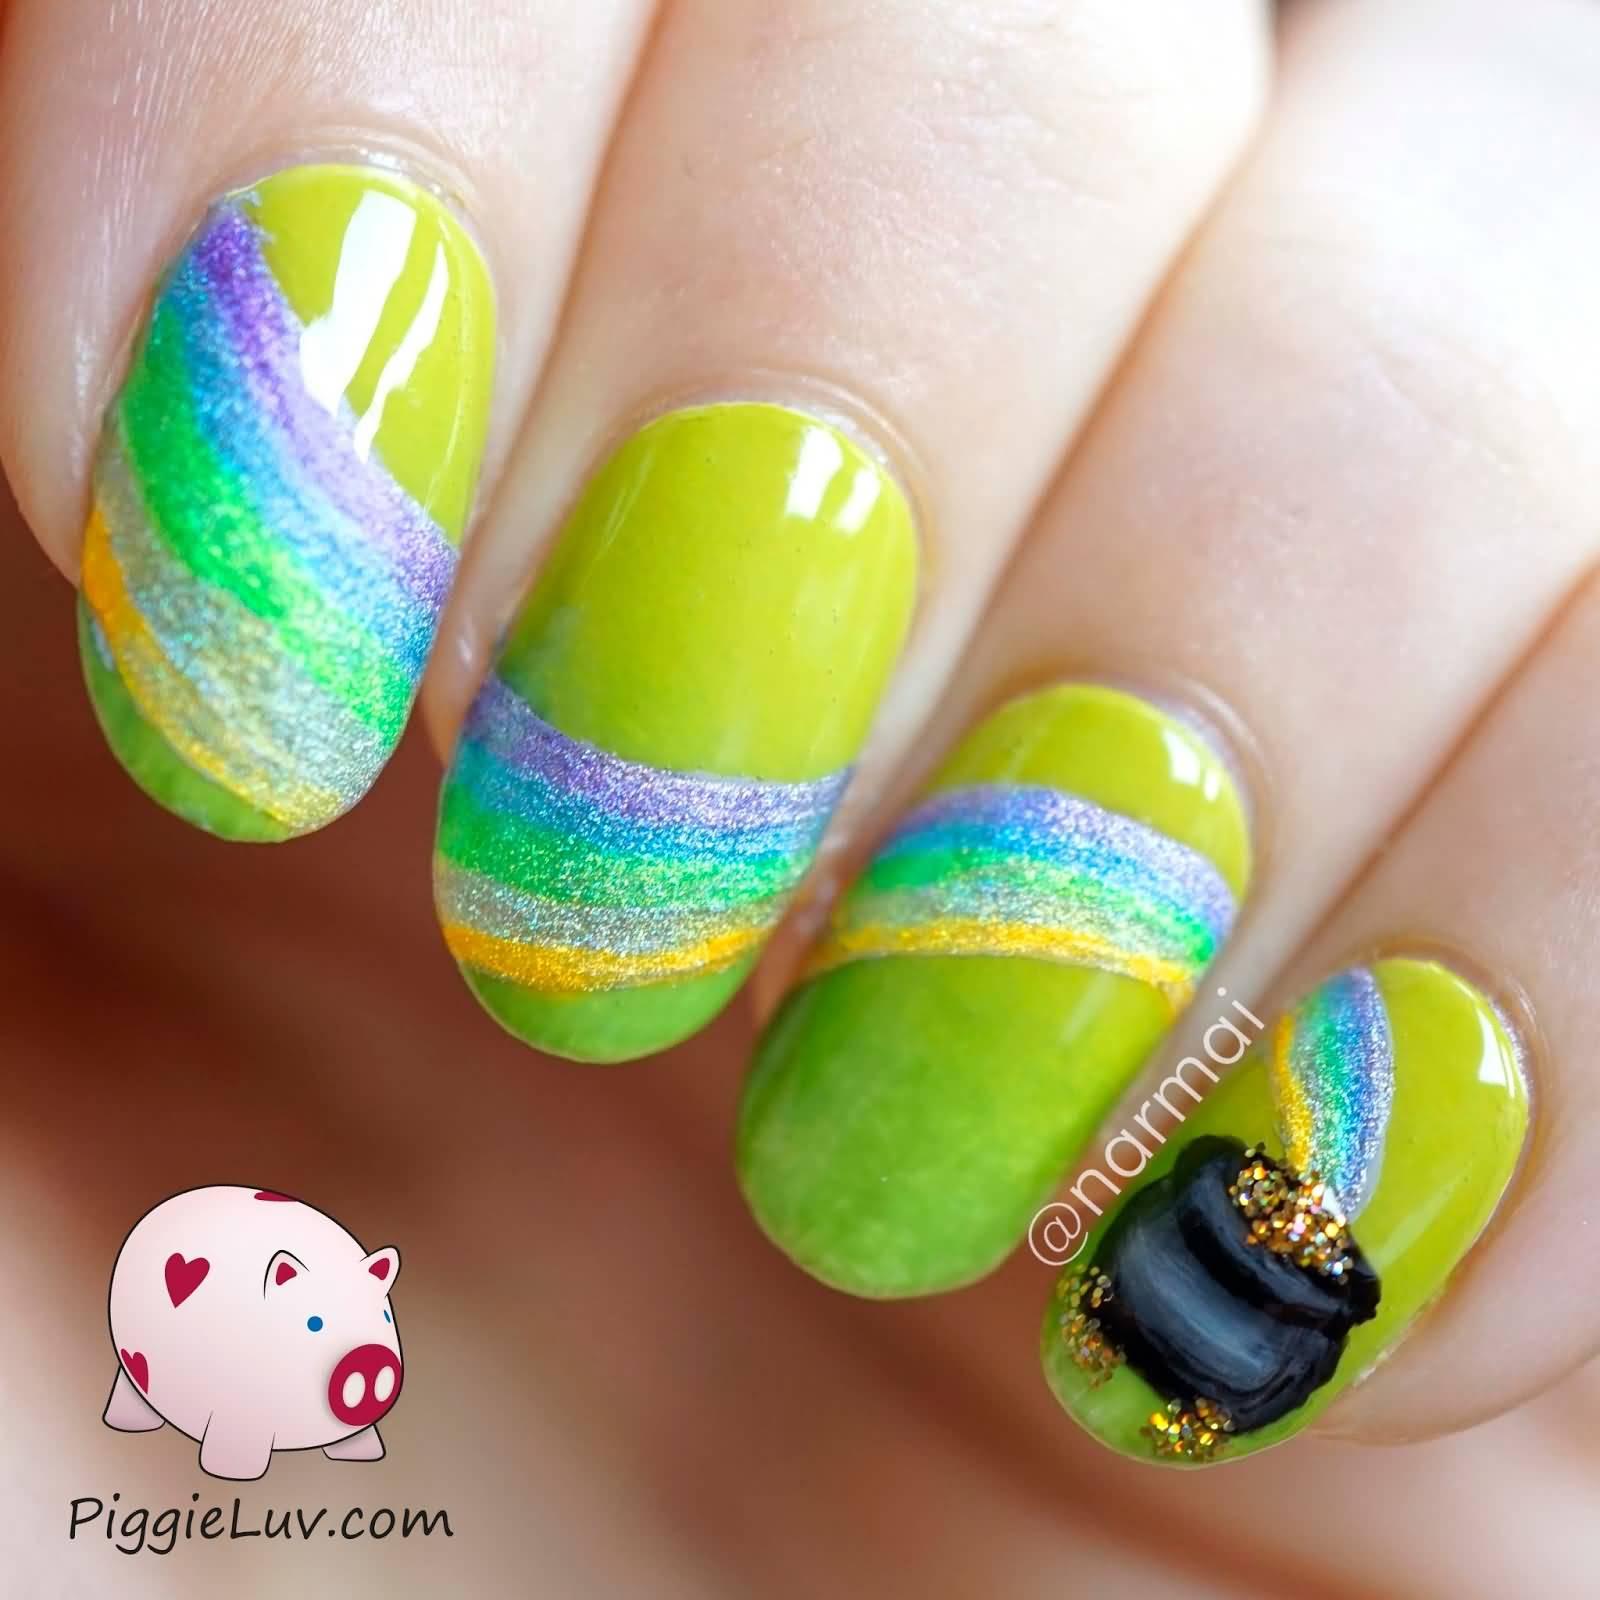 Rainbow Design And Pot Of Gold Saint Patrick\'s Day Nail Art